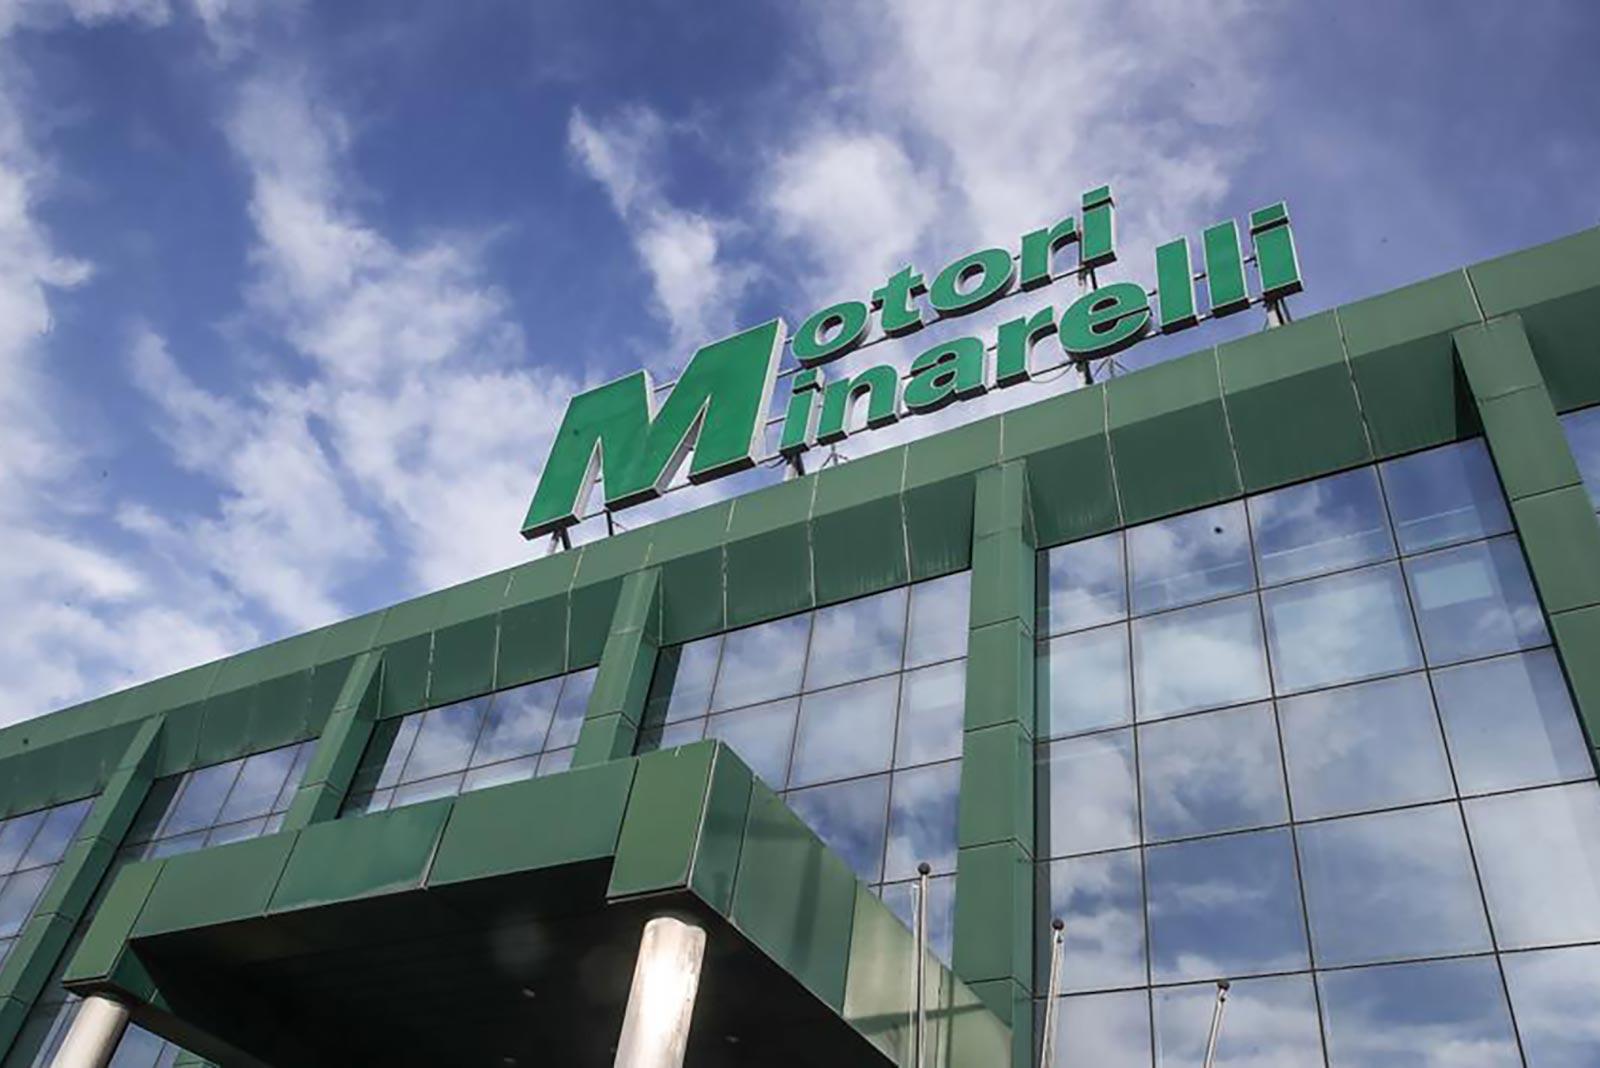 Fantic Motor покупает Motori Minarelli у Yamaha Motor Europe